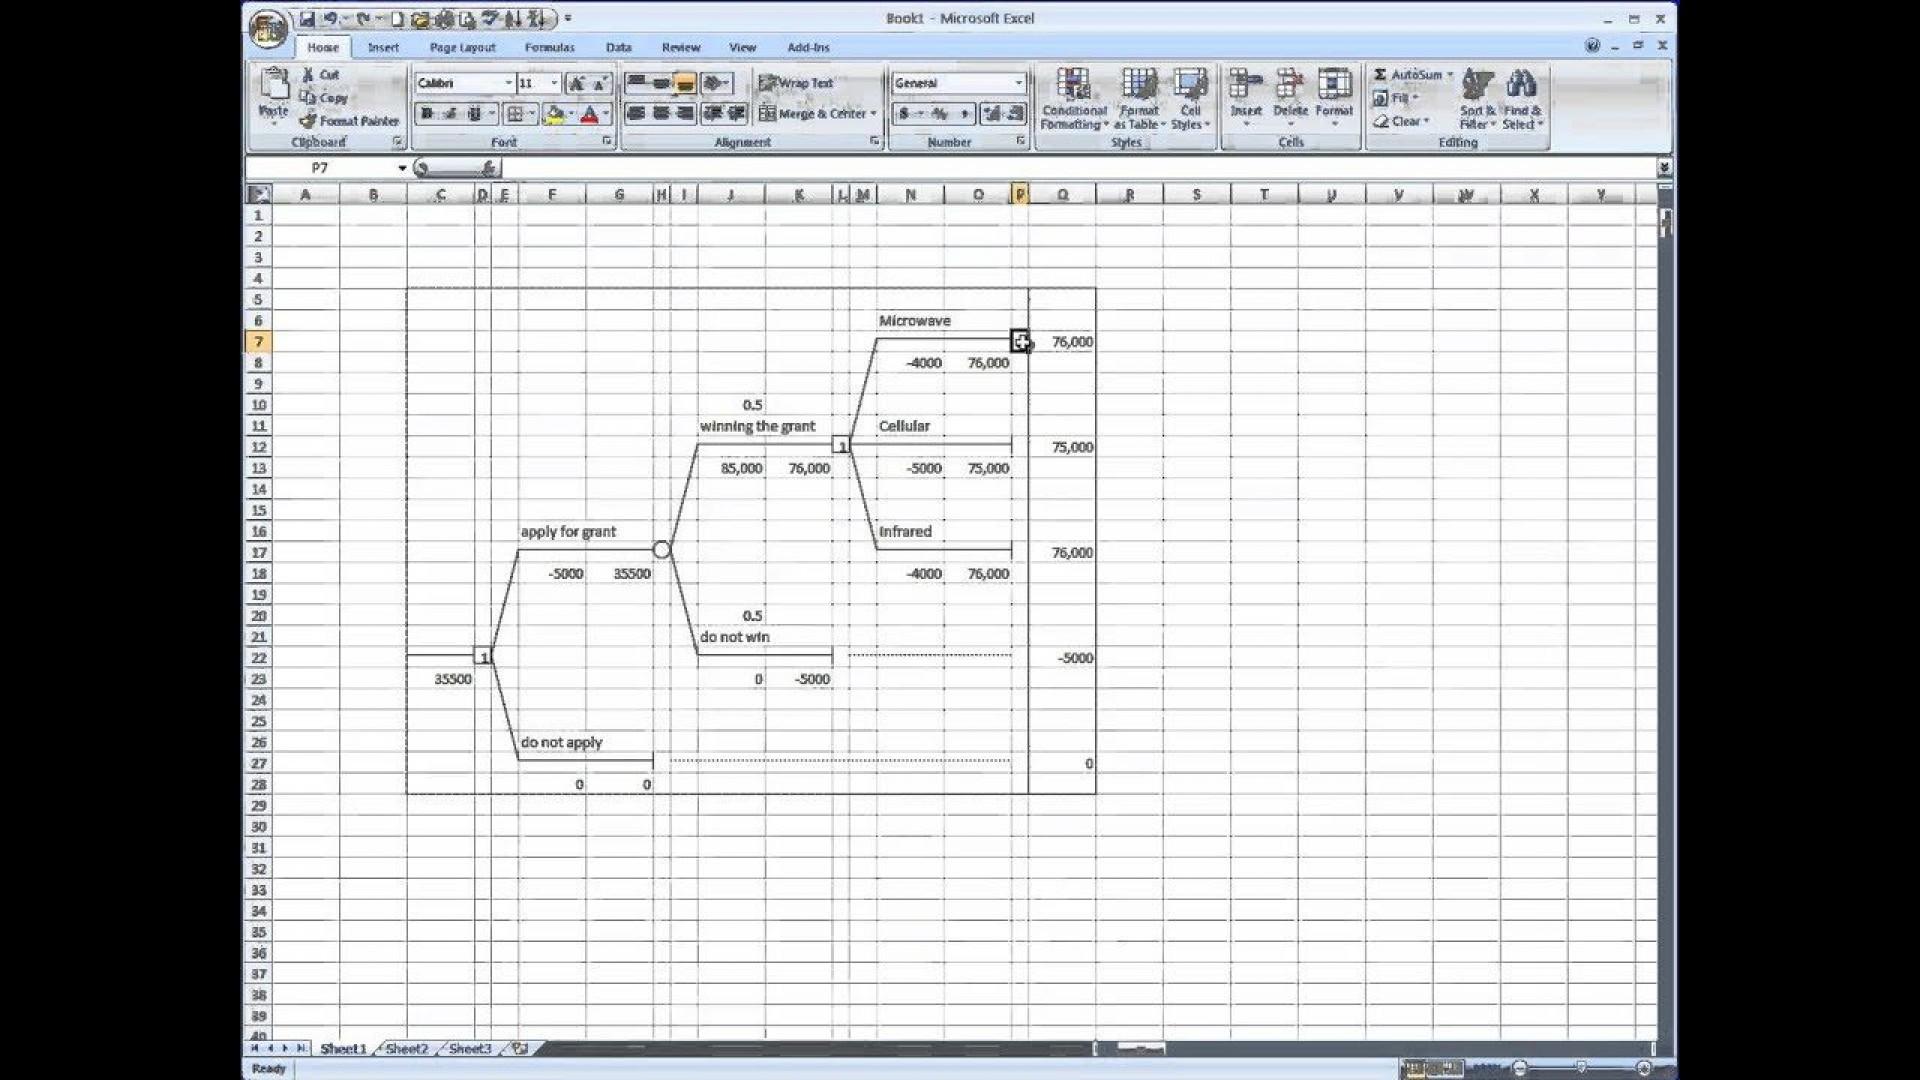 009 Impressive Decision Tree Diagram Template Excel Image  Chart1920